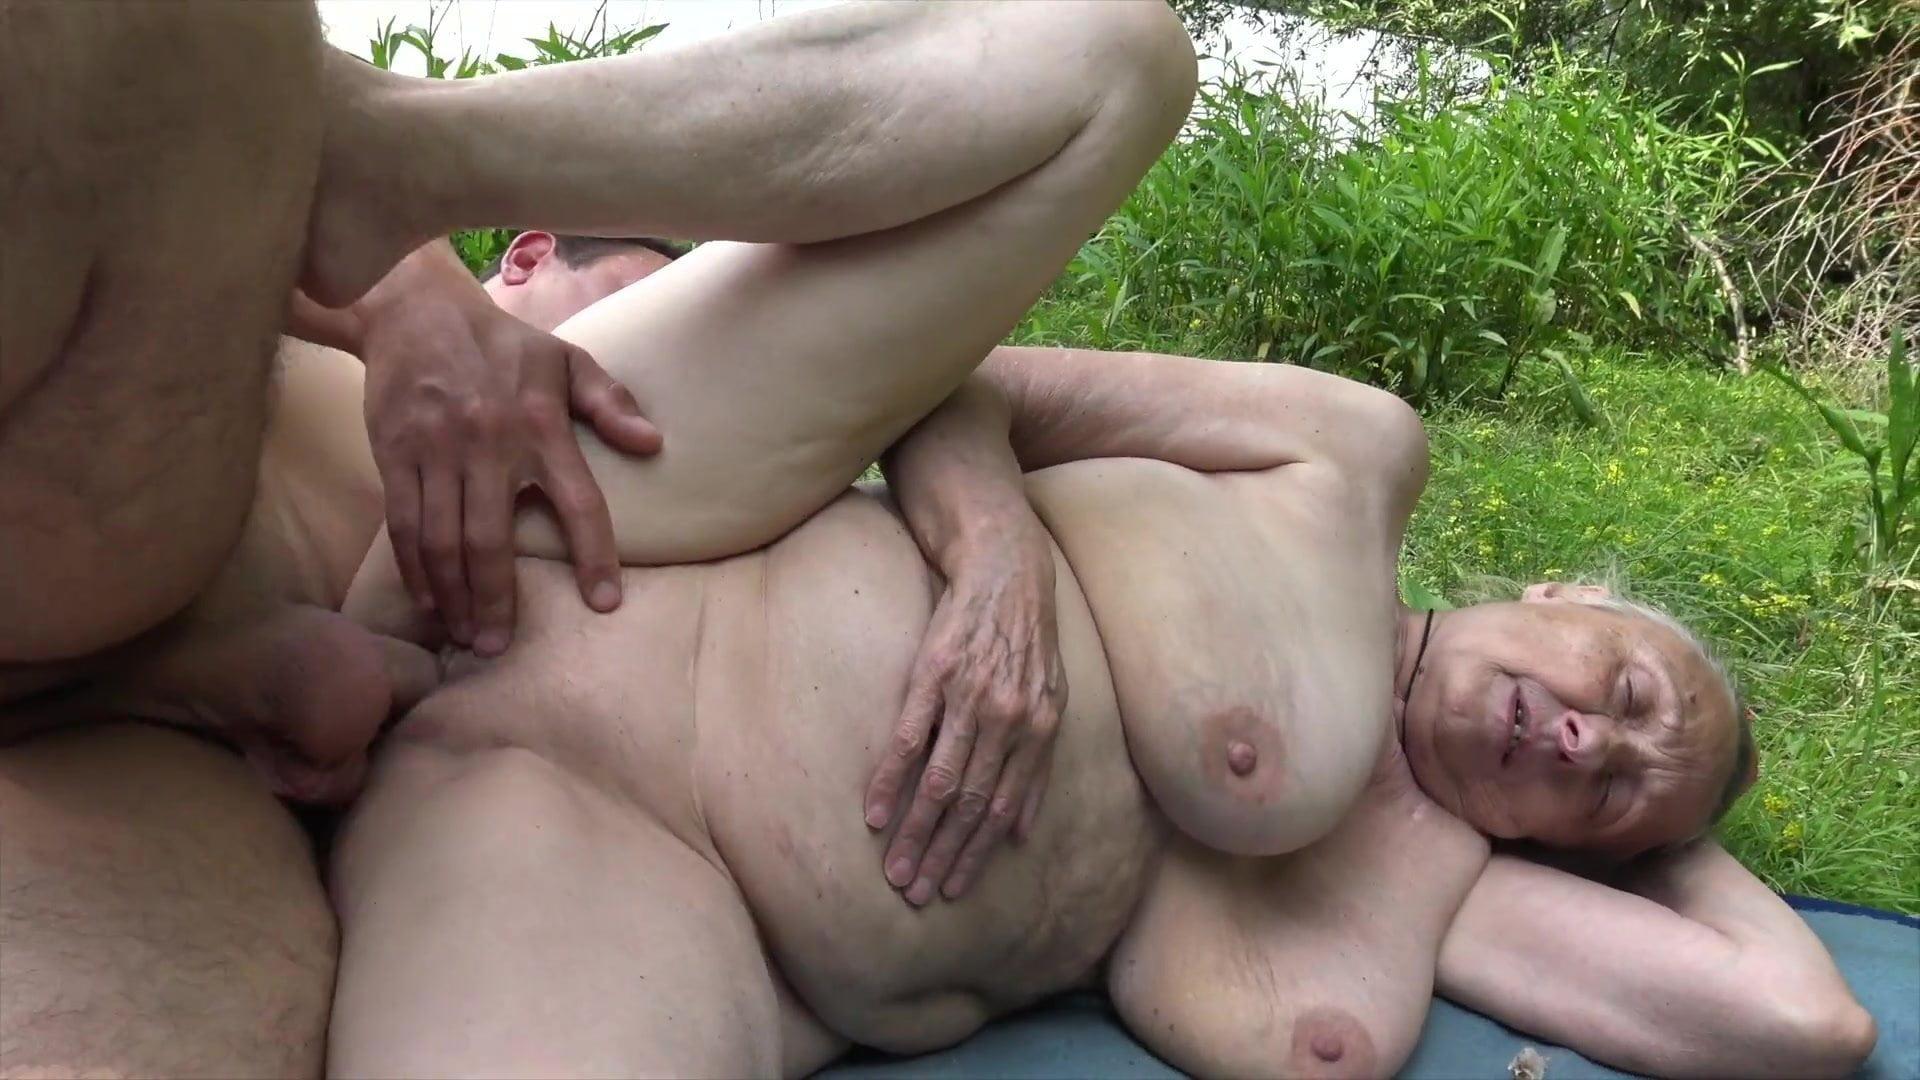 Free public anal toy porn pics